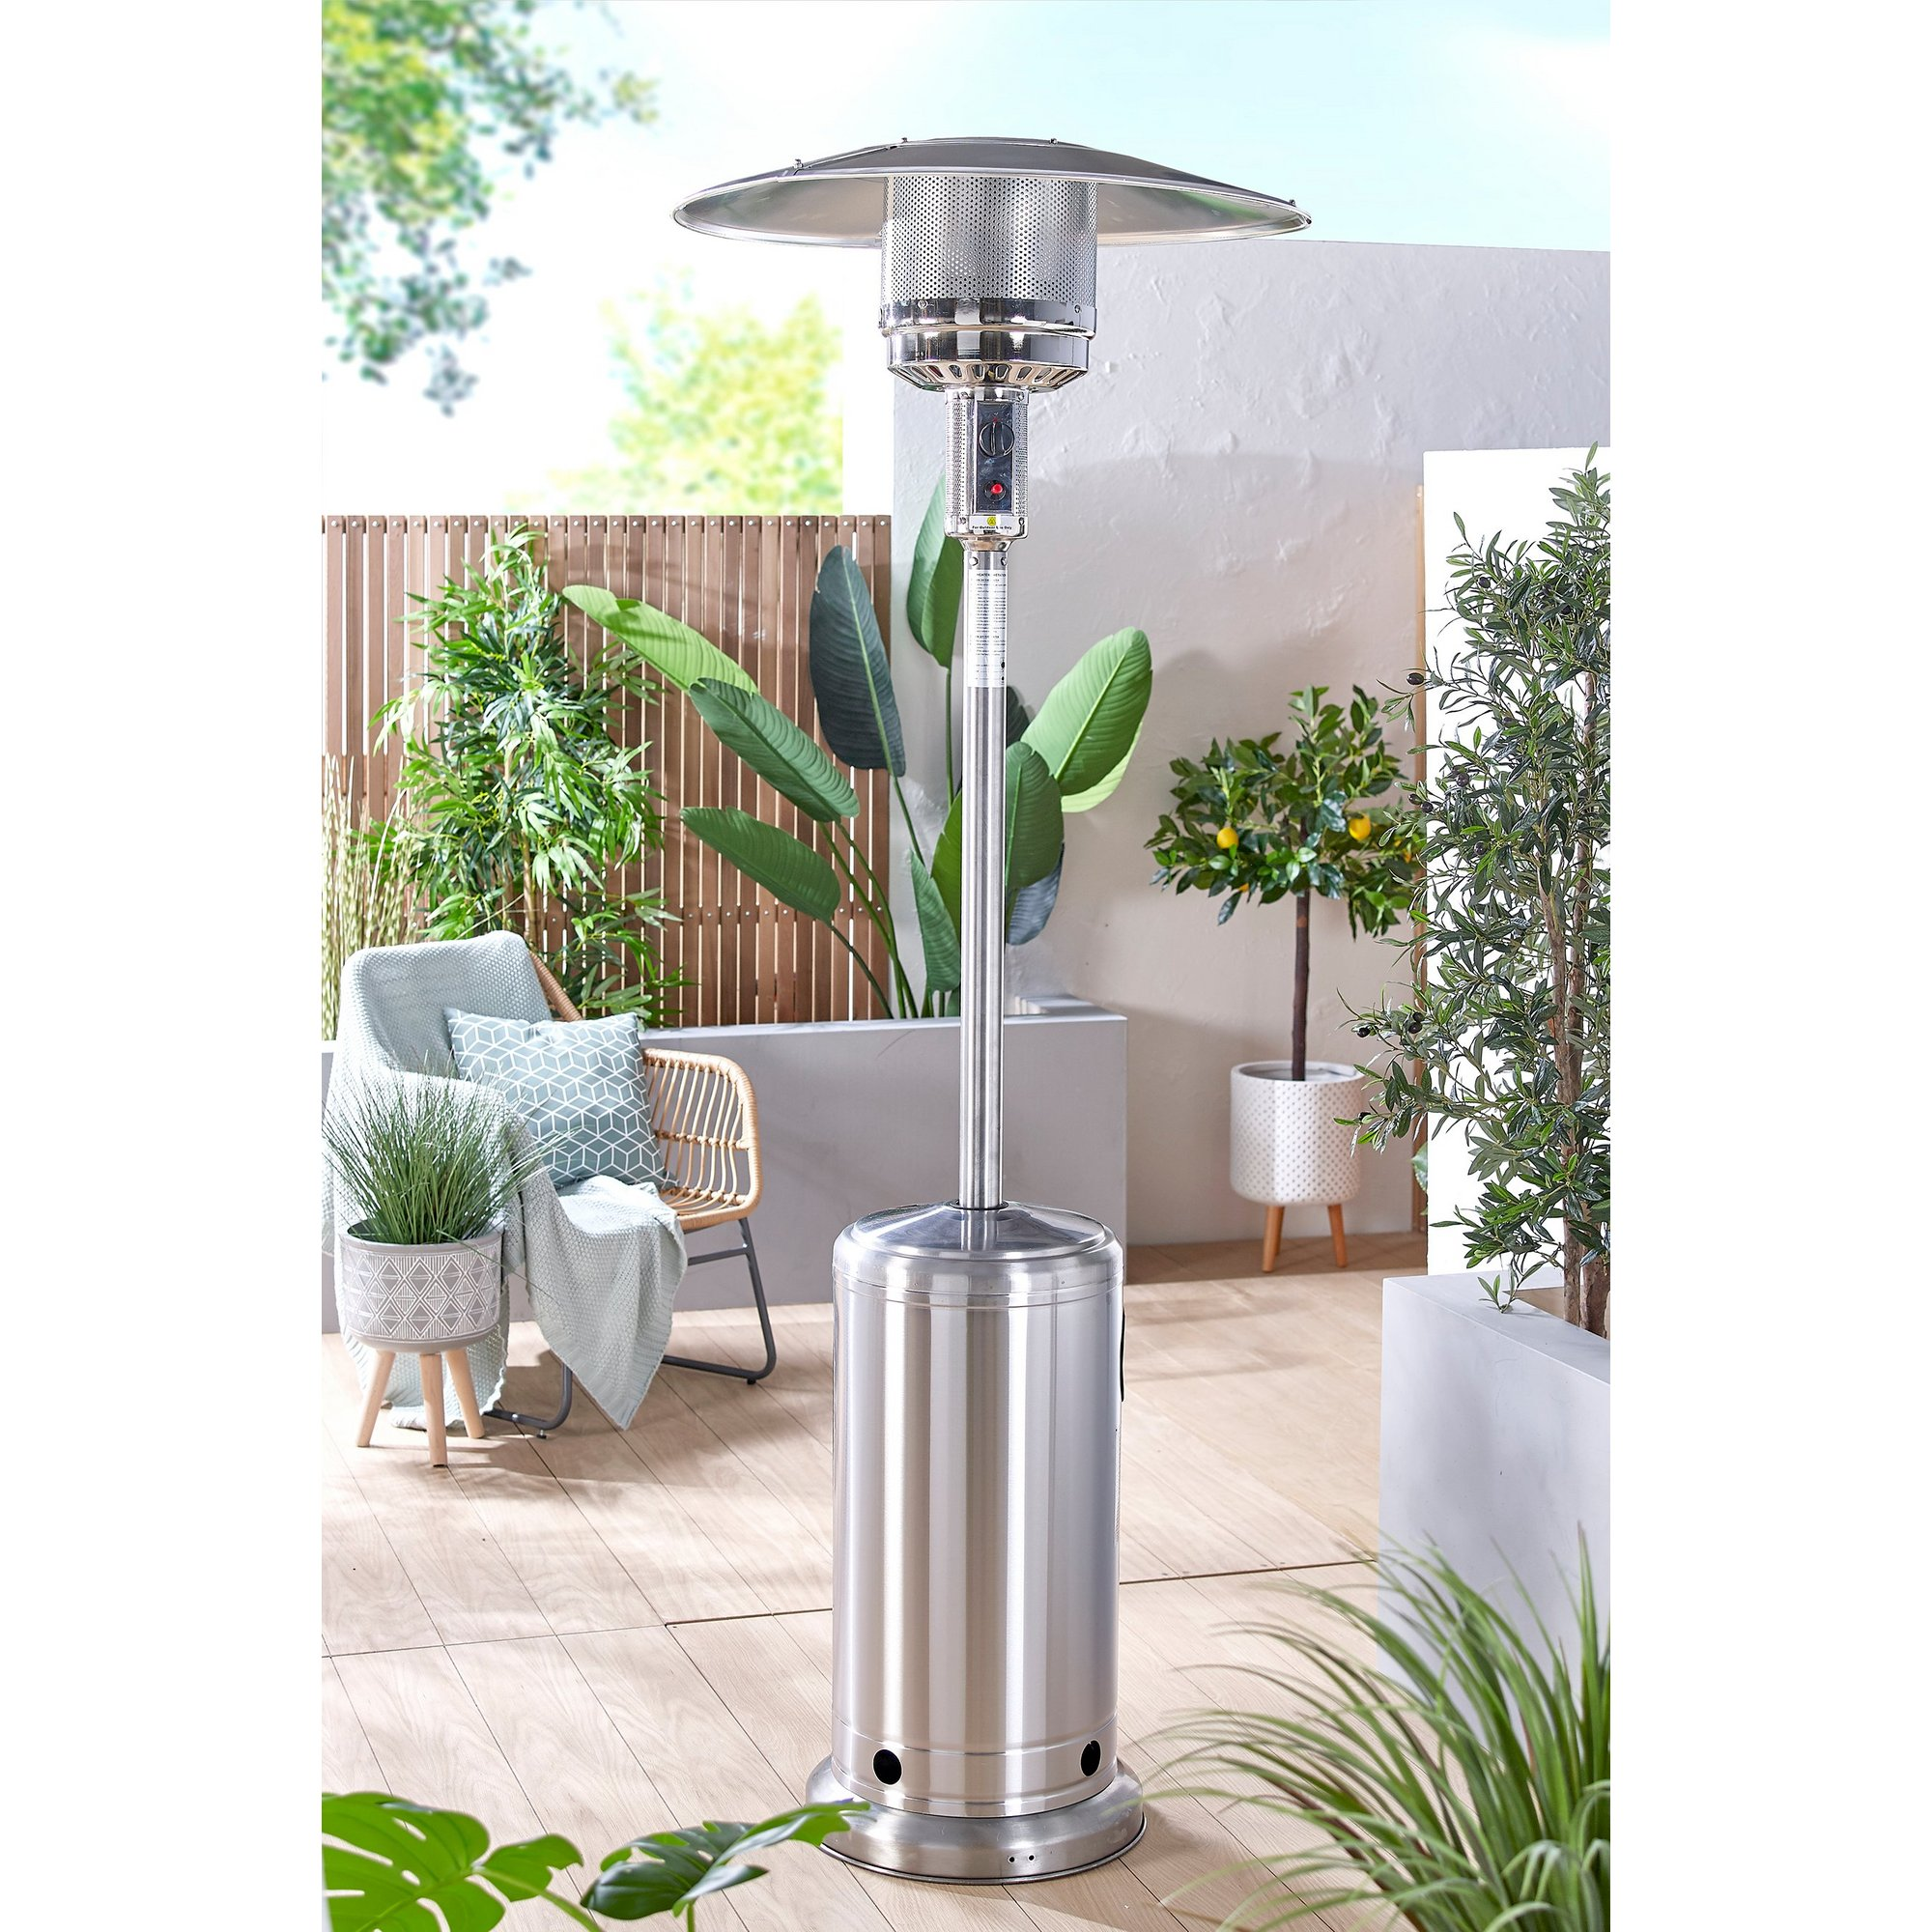 Image of Mushroom Gas Outdoor Patio Heater